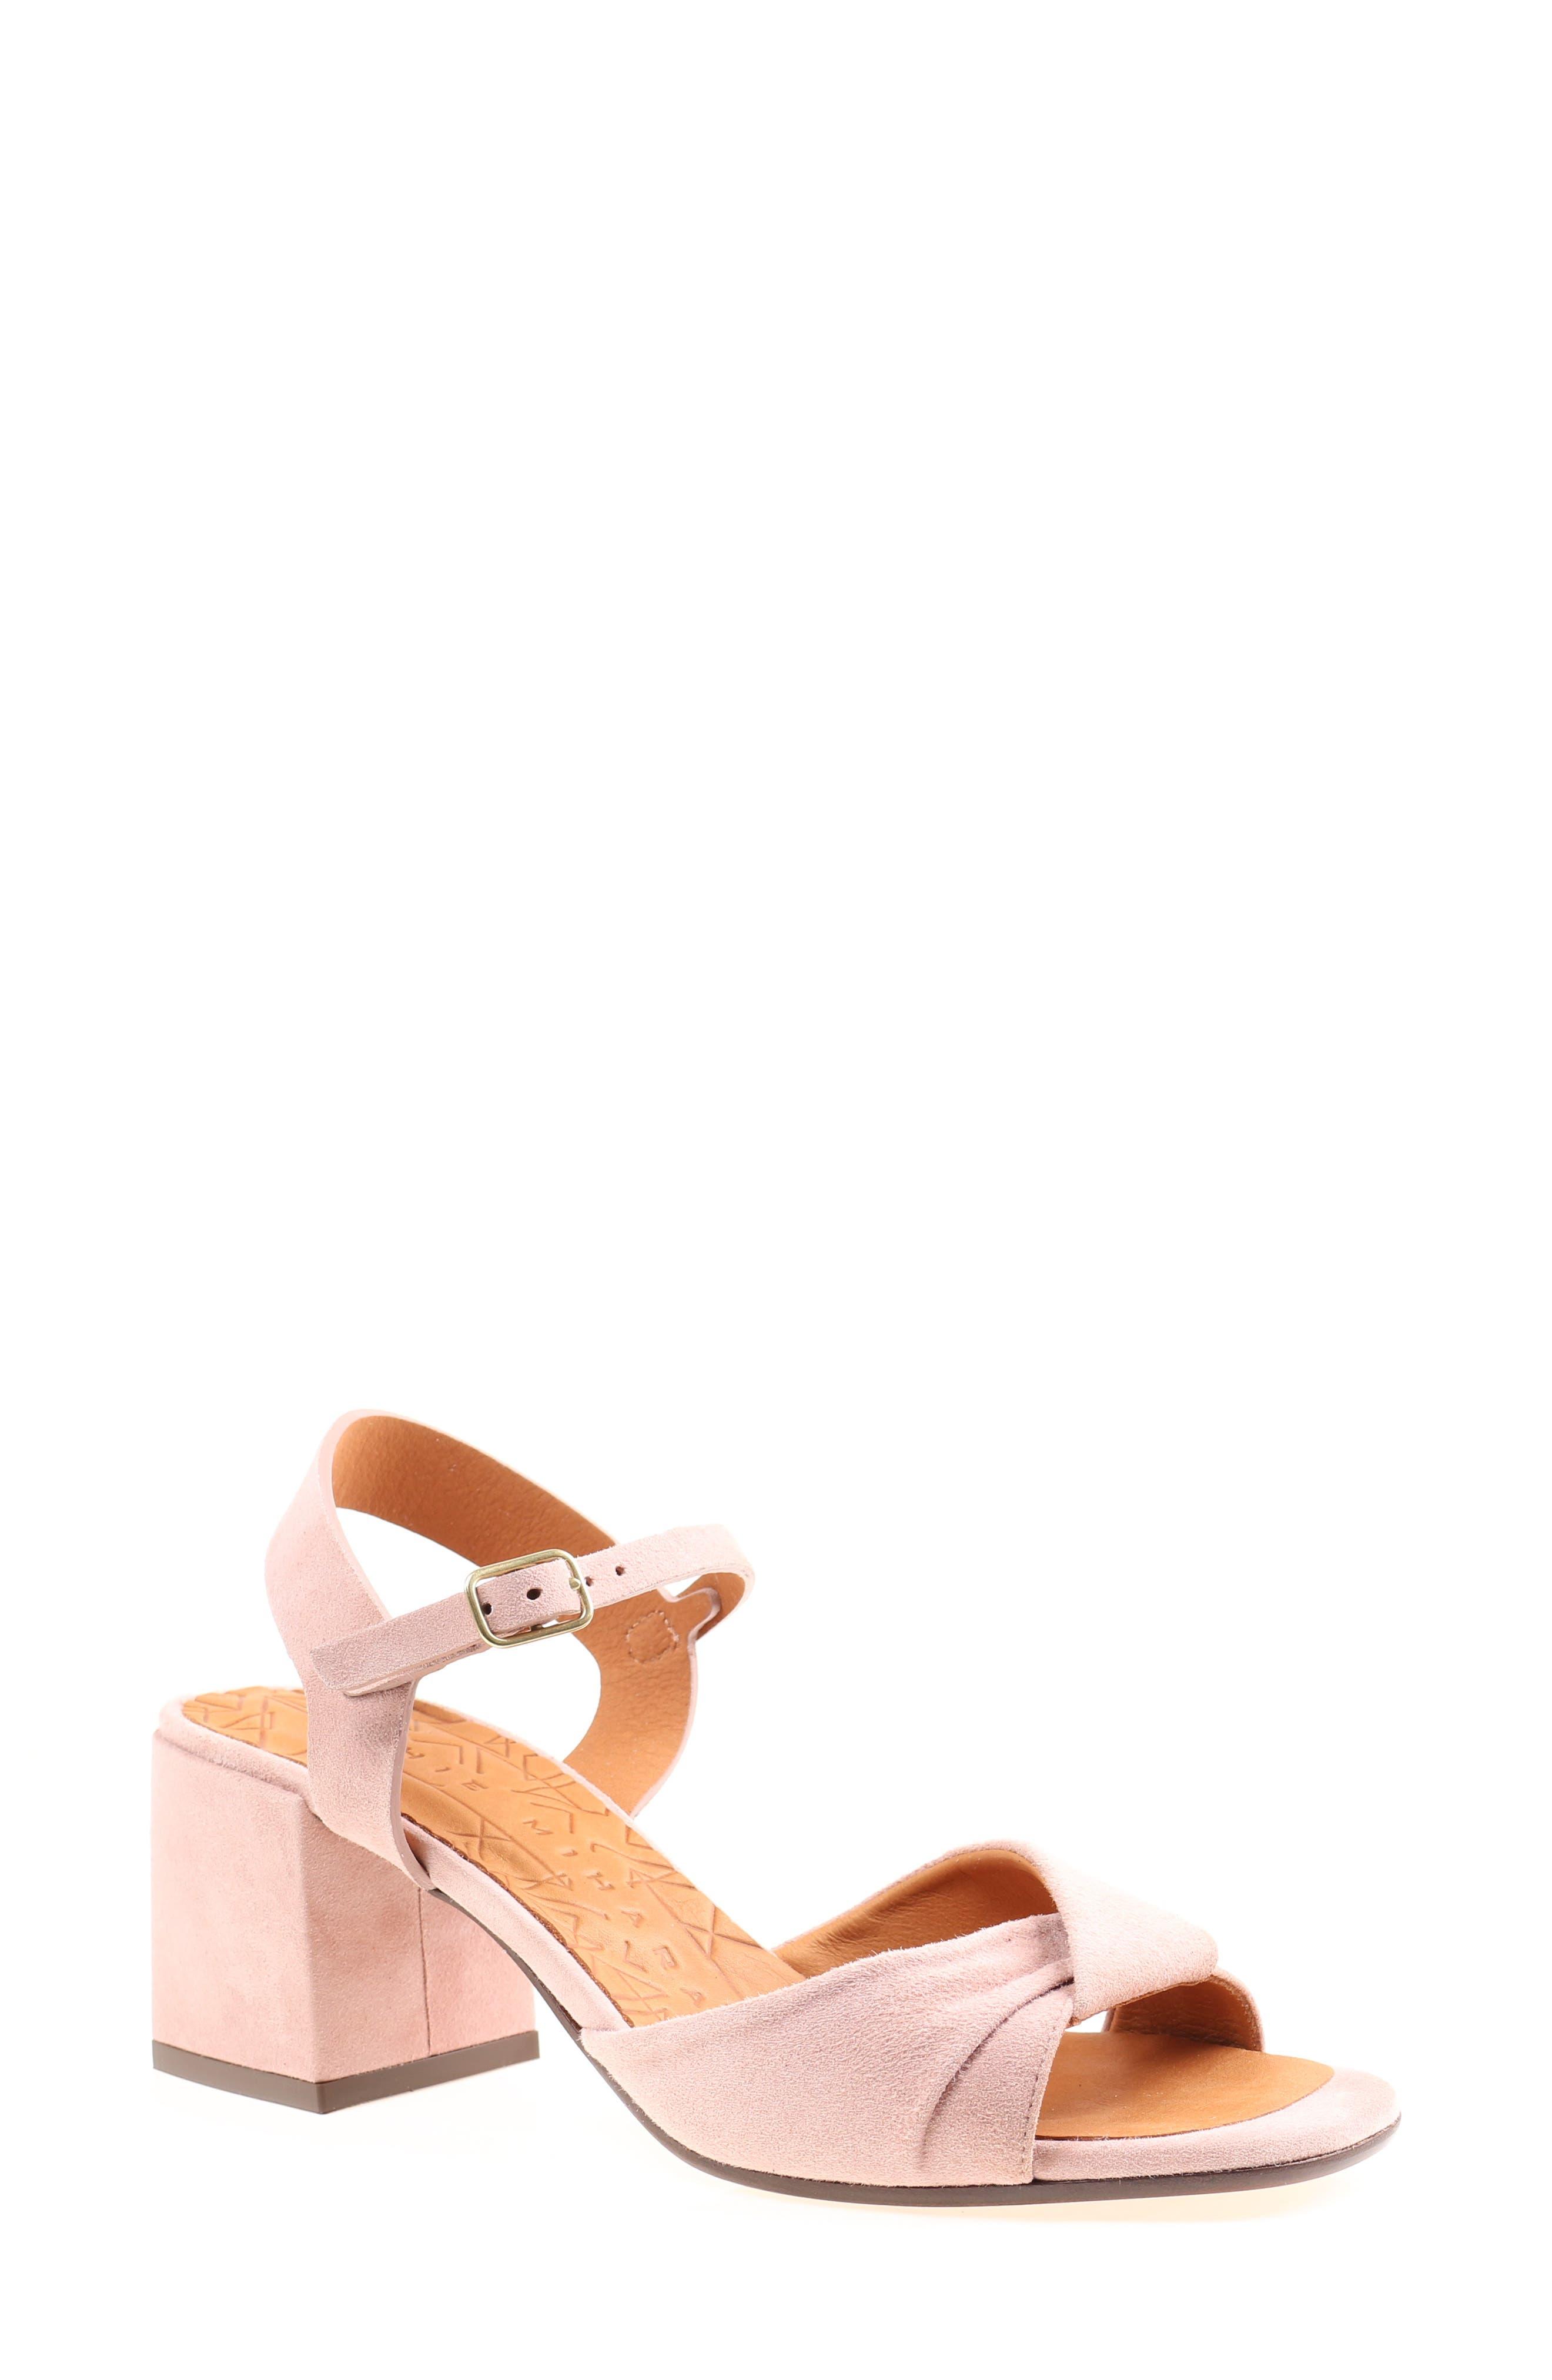 Leli Sandal,                         Main,                         color,